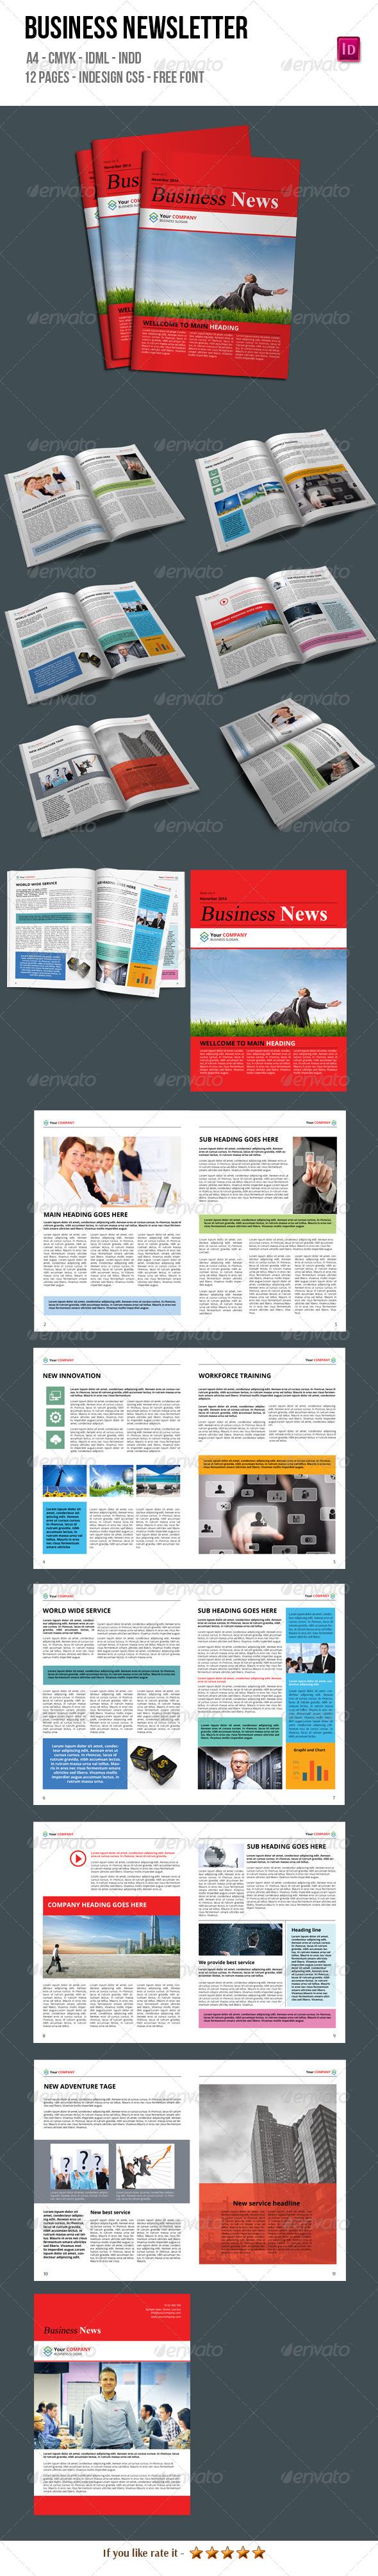 business-newsletter1